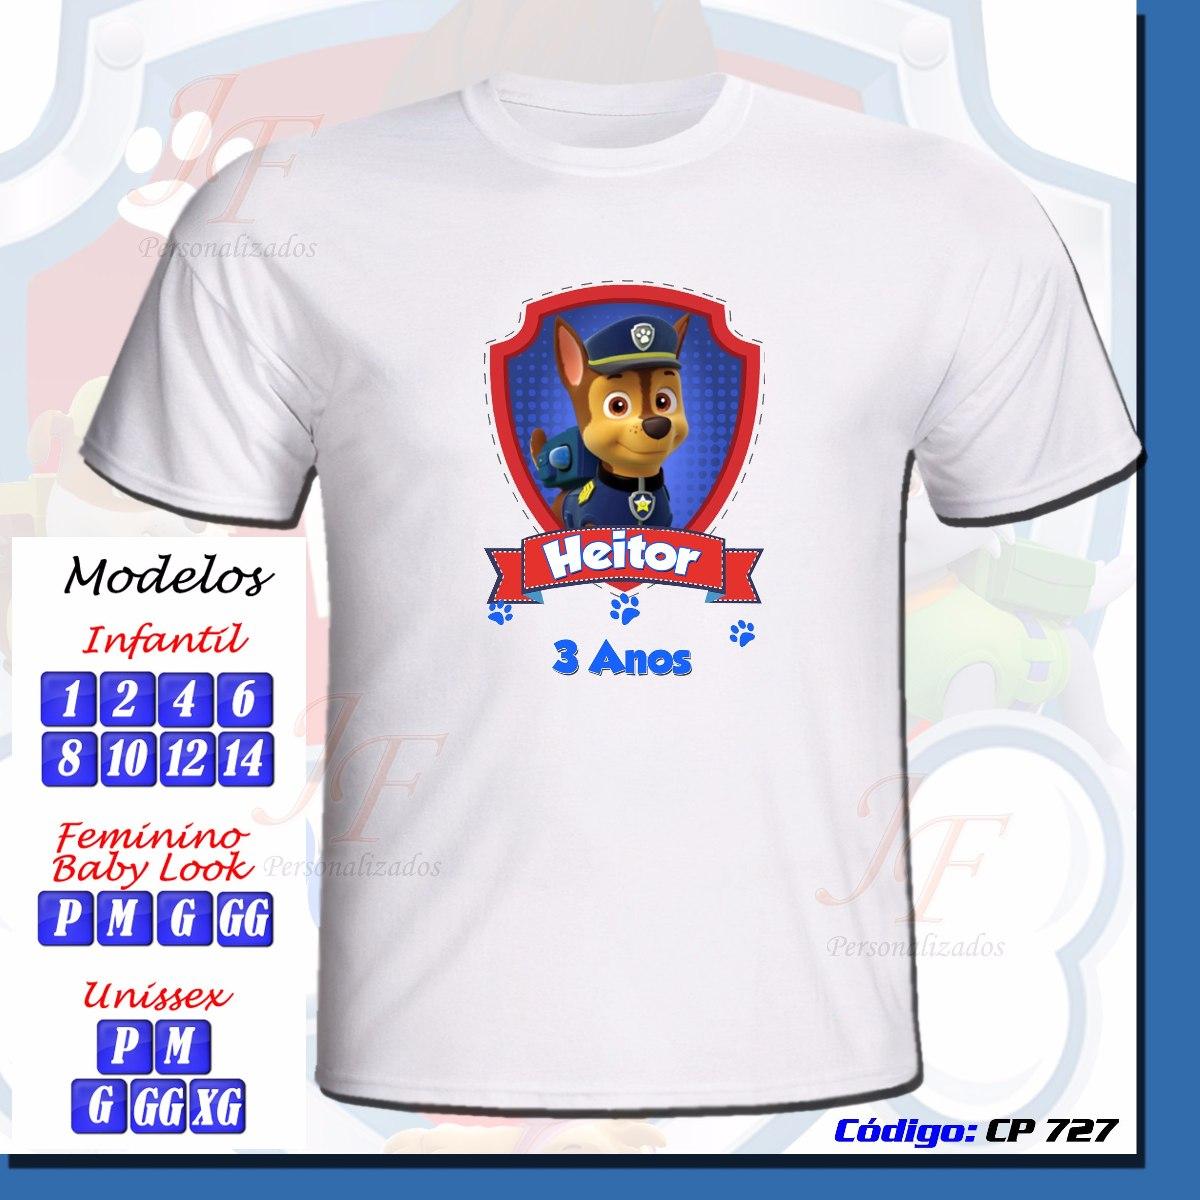 692333edfc 01 camiseta adulto infantil personalizada patrulha canina. Carregando zoom.